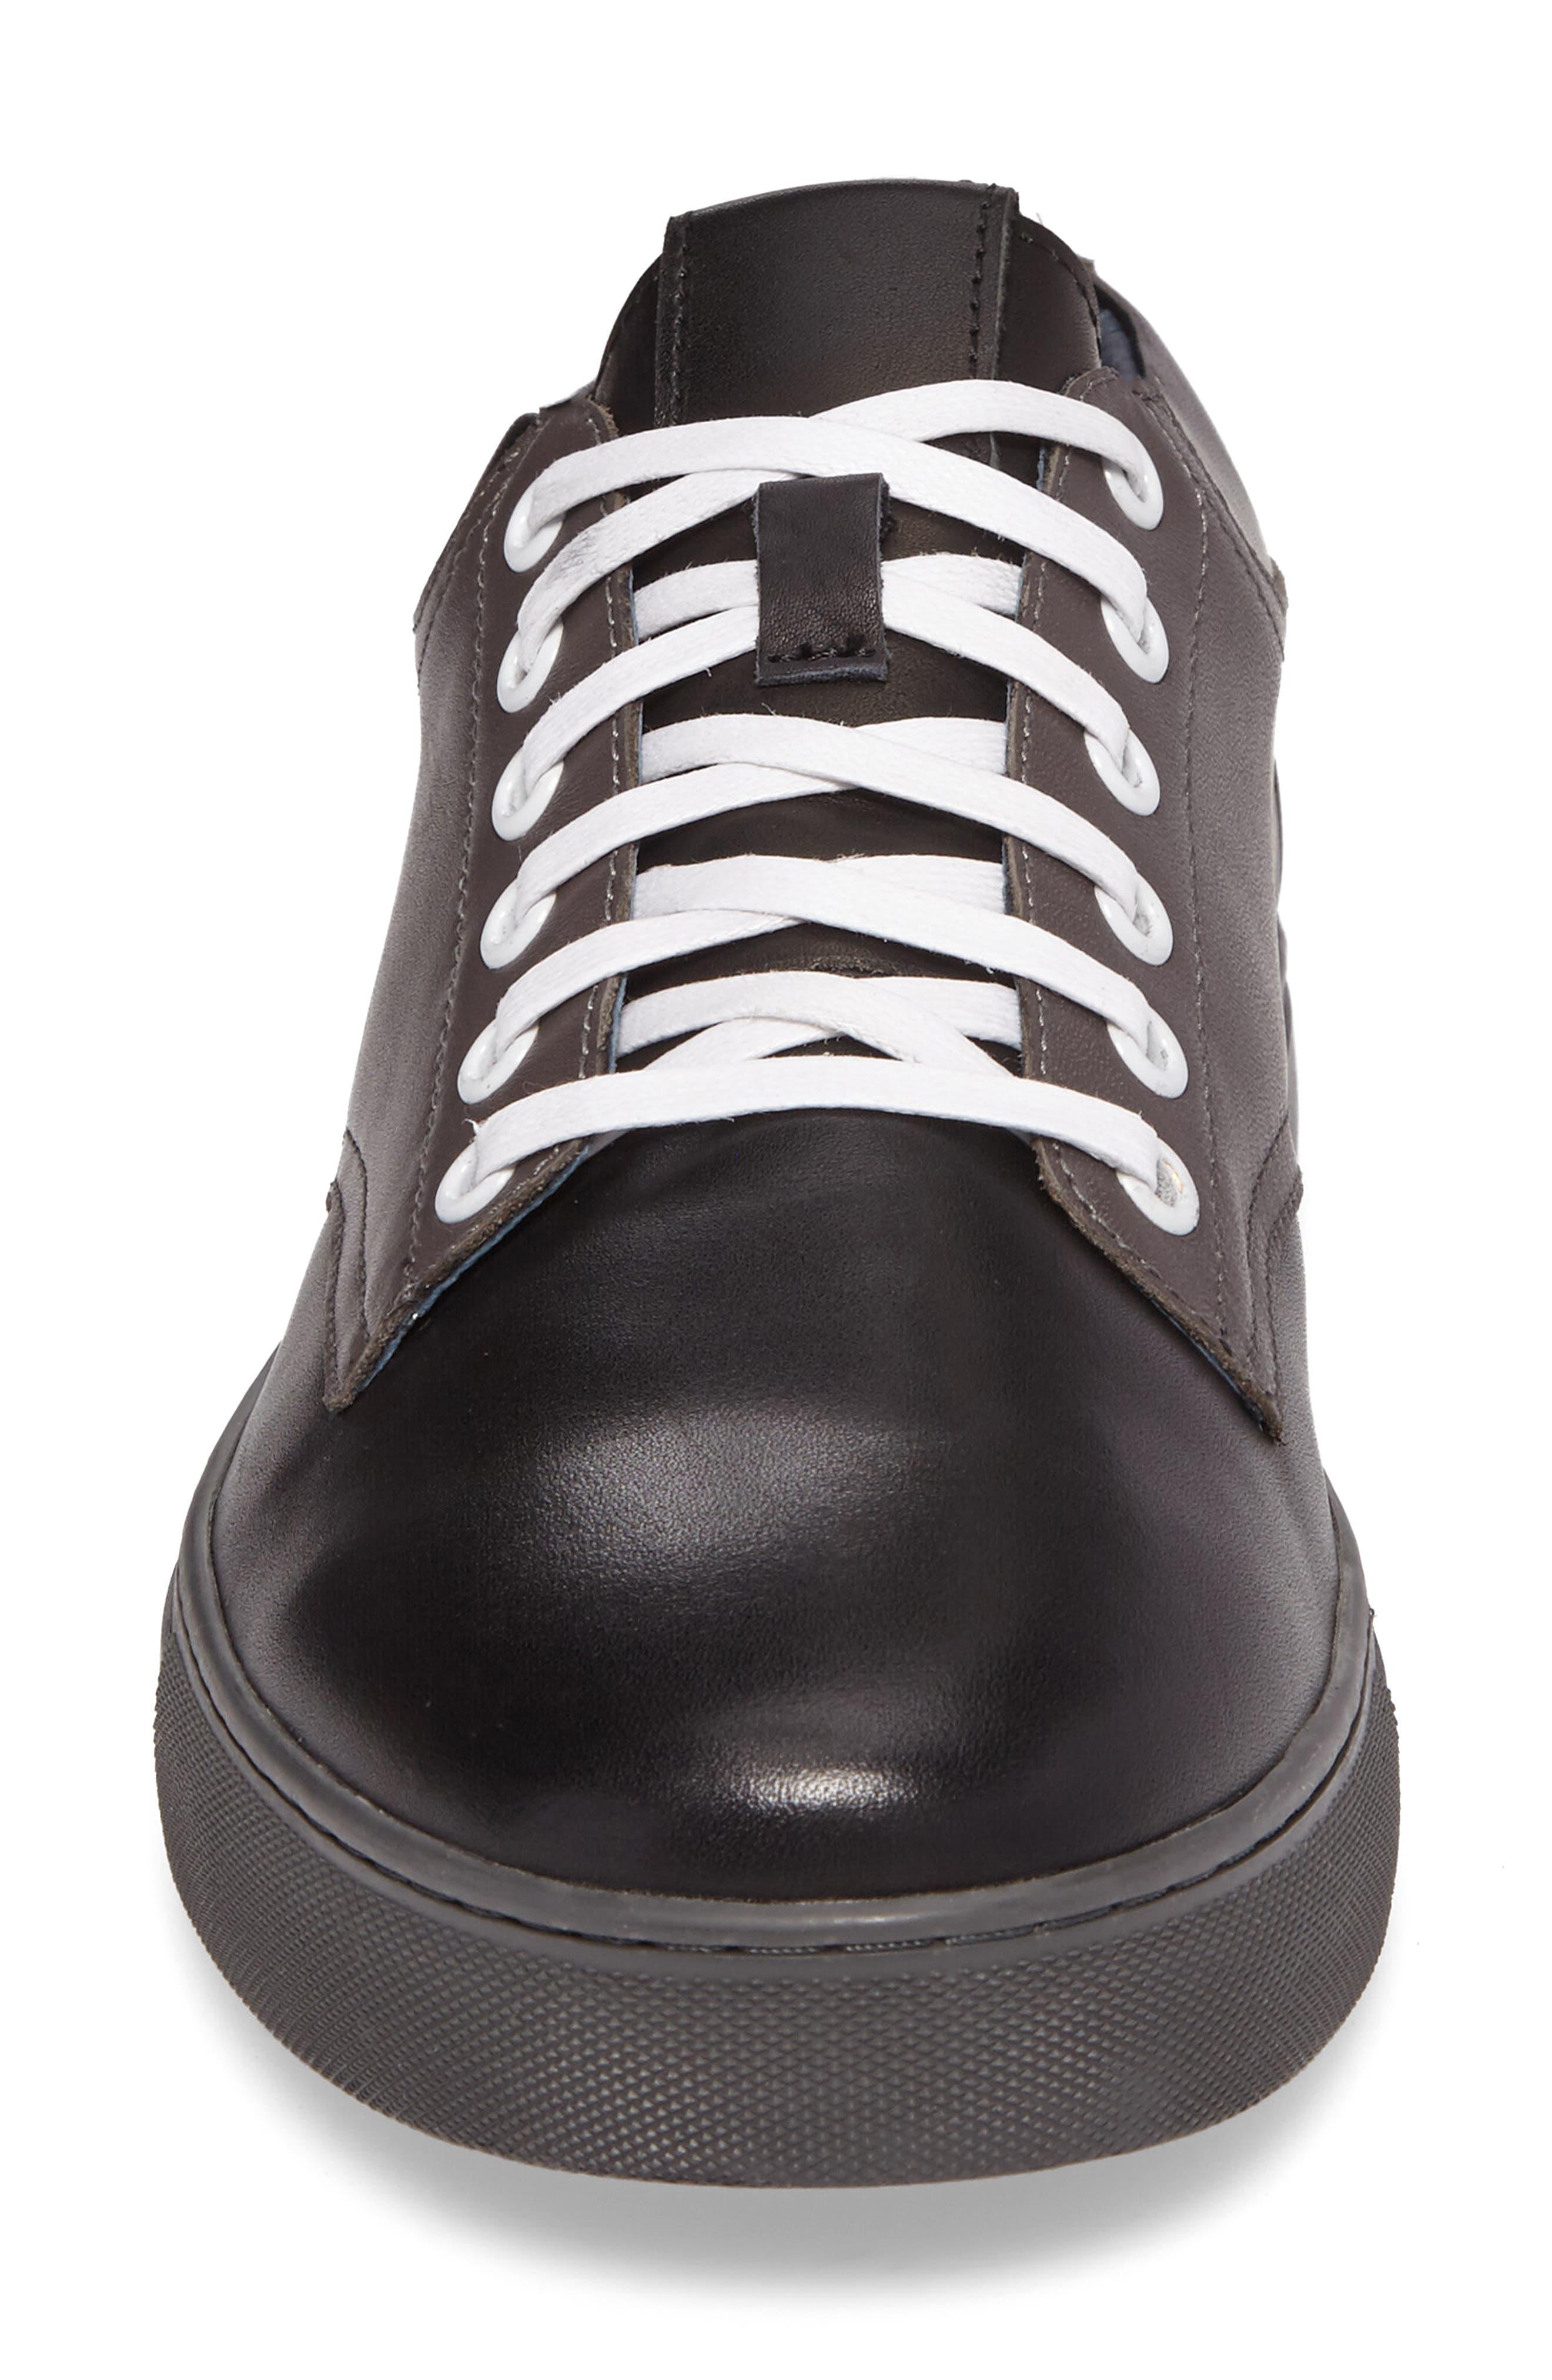 Alternate Image 4  - Zanzara Ralston Sneaker (Men)